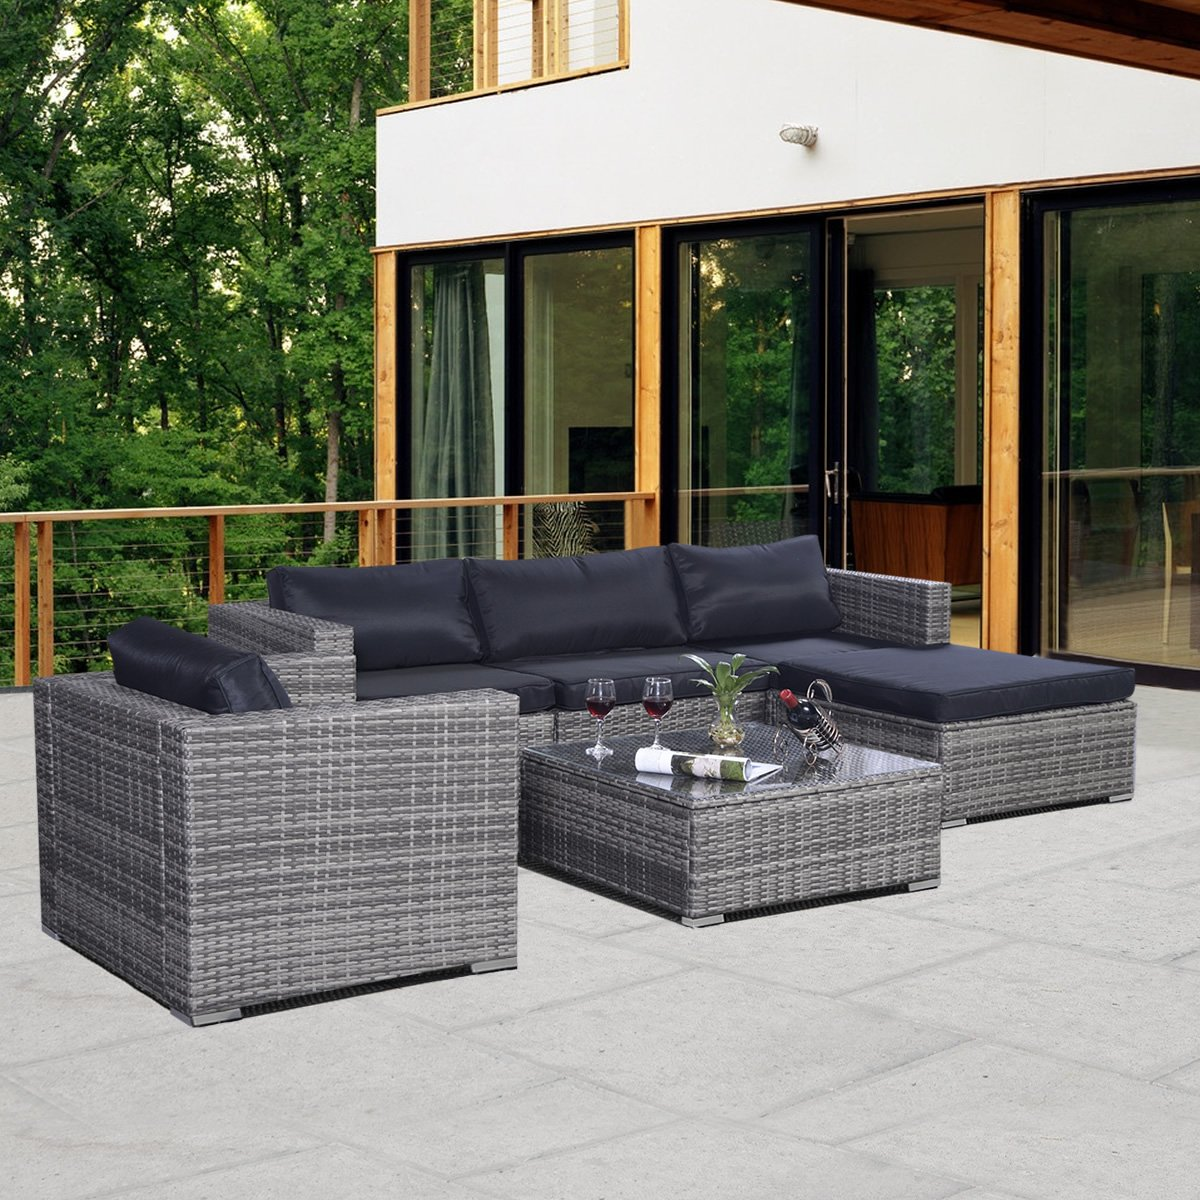 Amazon.de: 13tlg.Lounge Set Gartenmöbel Rattan Set Polyrattan ...